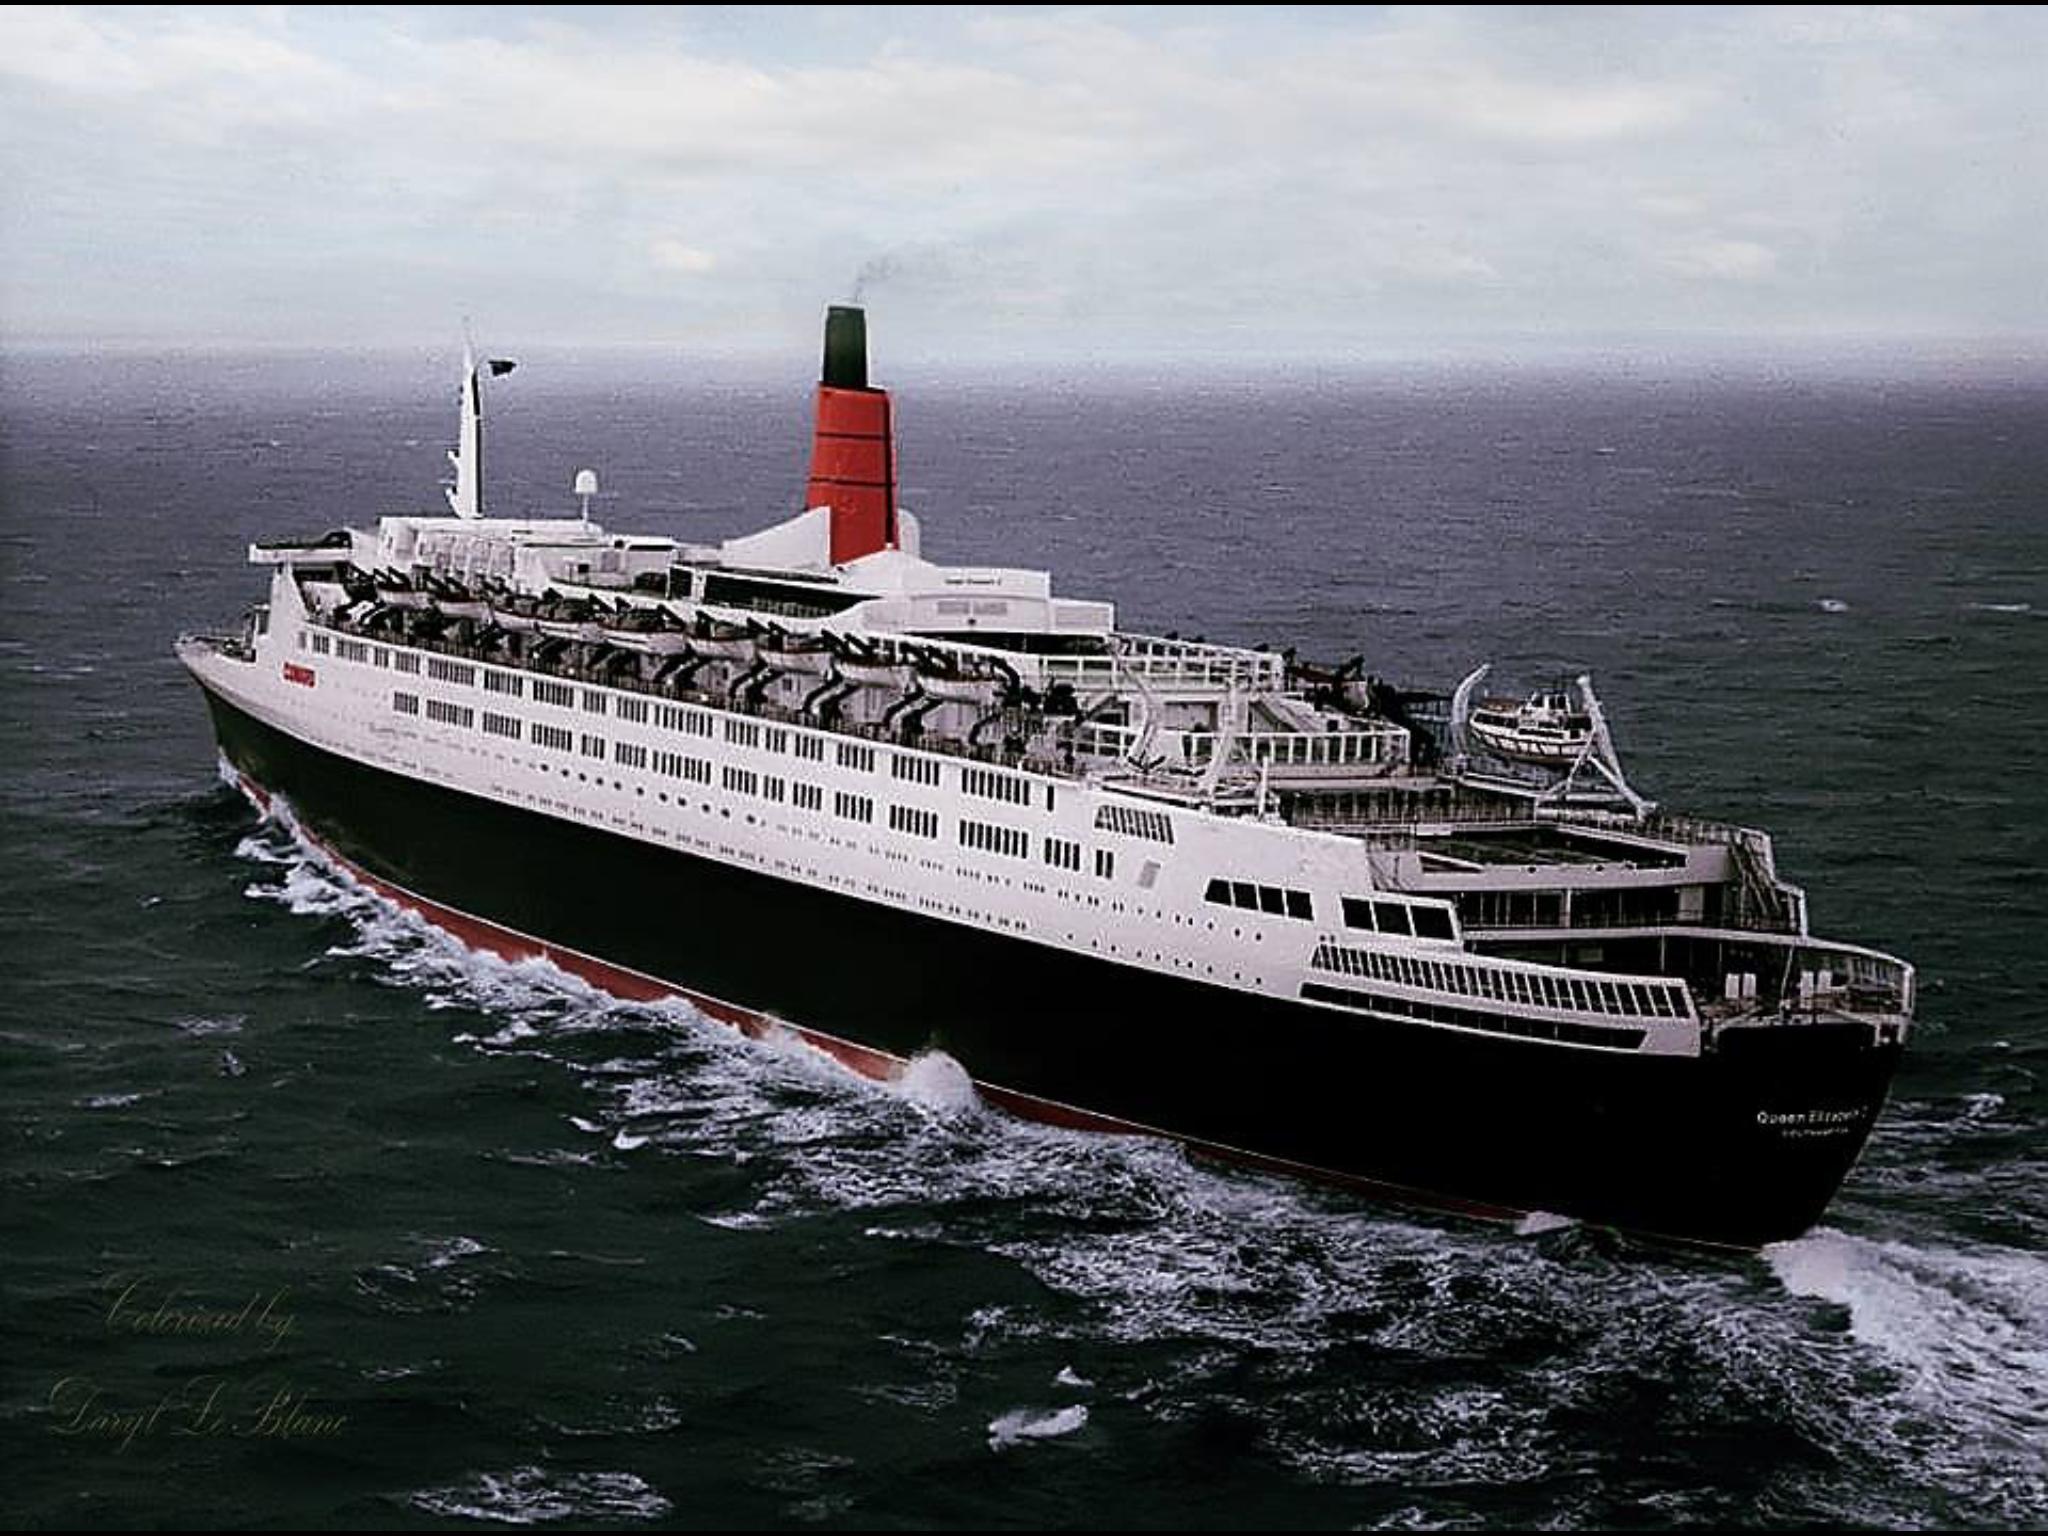 Pin By Vandeson Cruzeiros On Cunard Qe2 Cruise Liner Cunard Cruise Cunard Ships